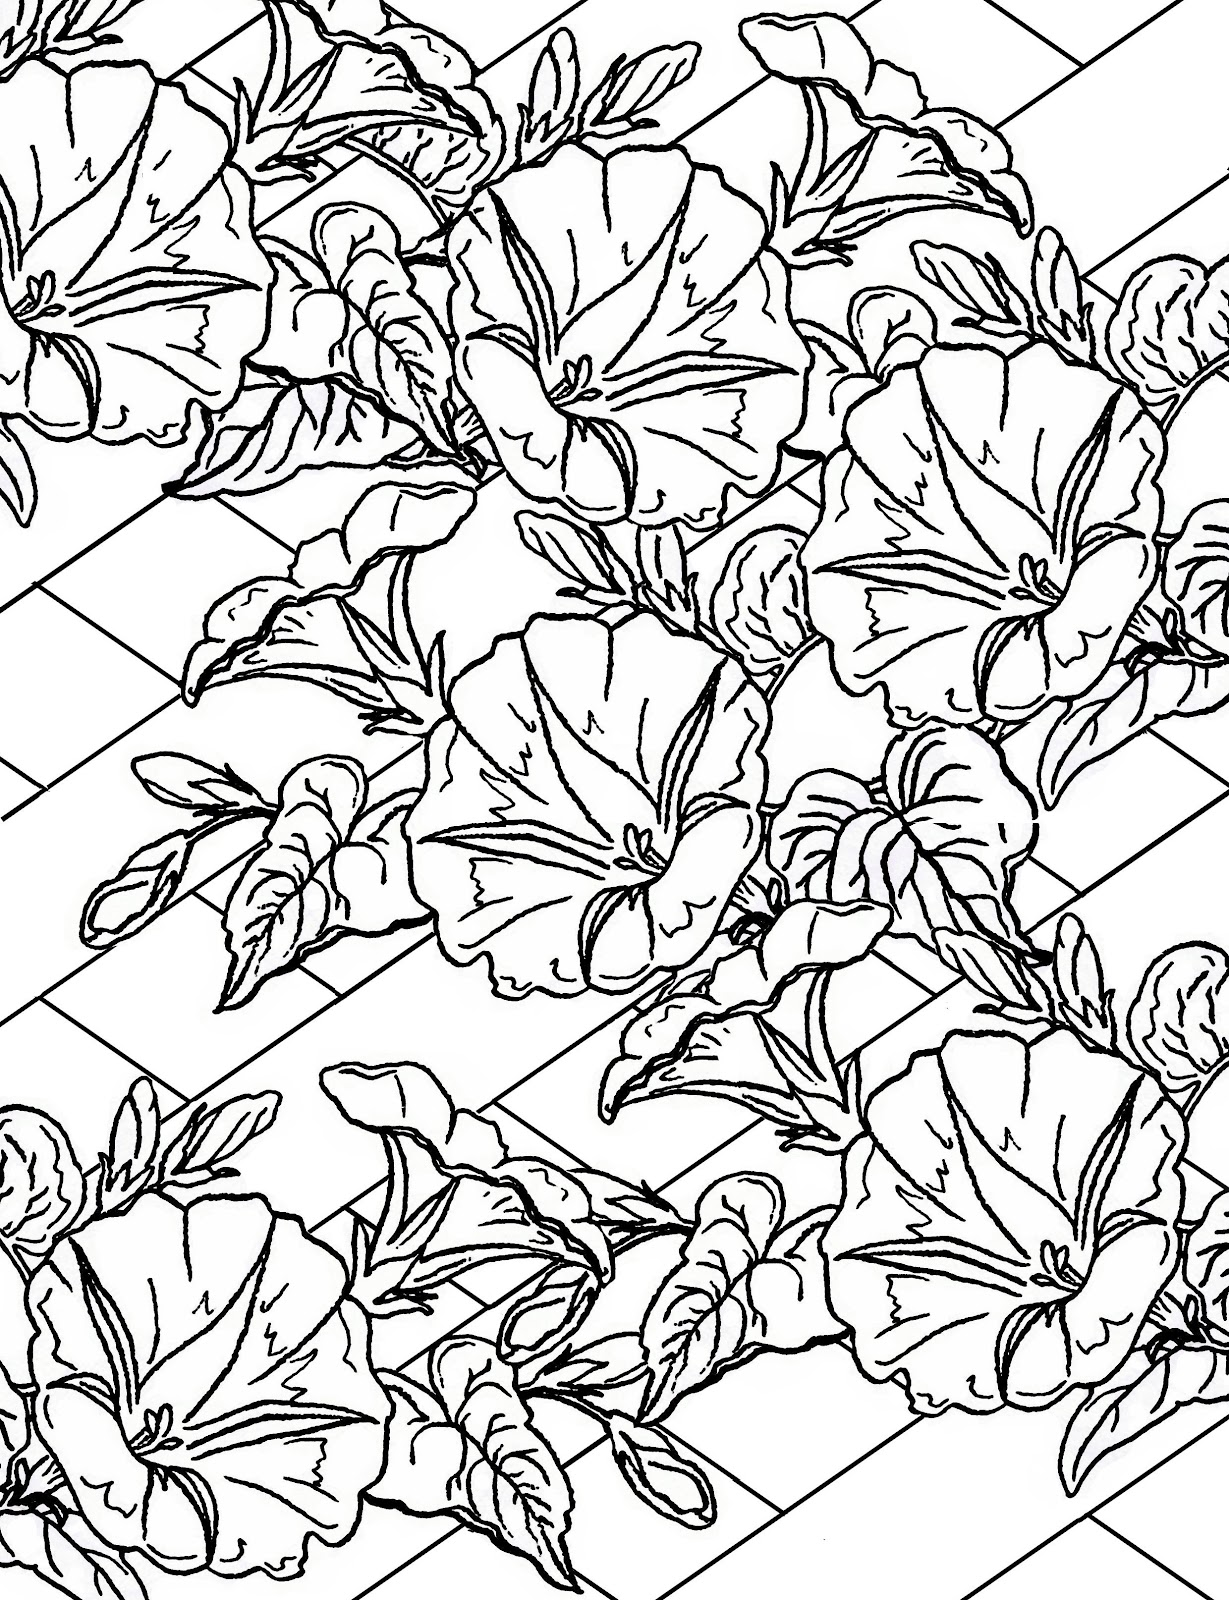 Lilac & Lavender: Morning Glory ~ Clip art & Printable